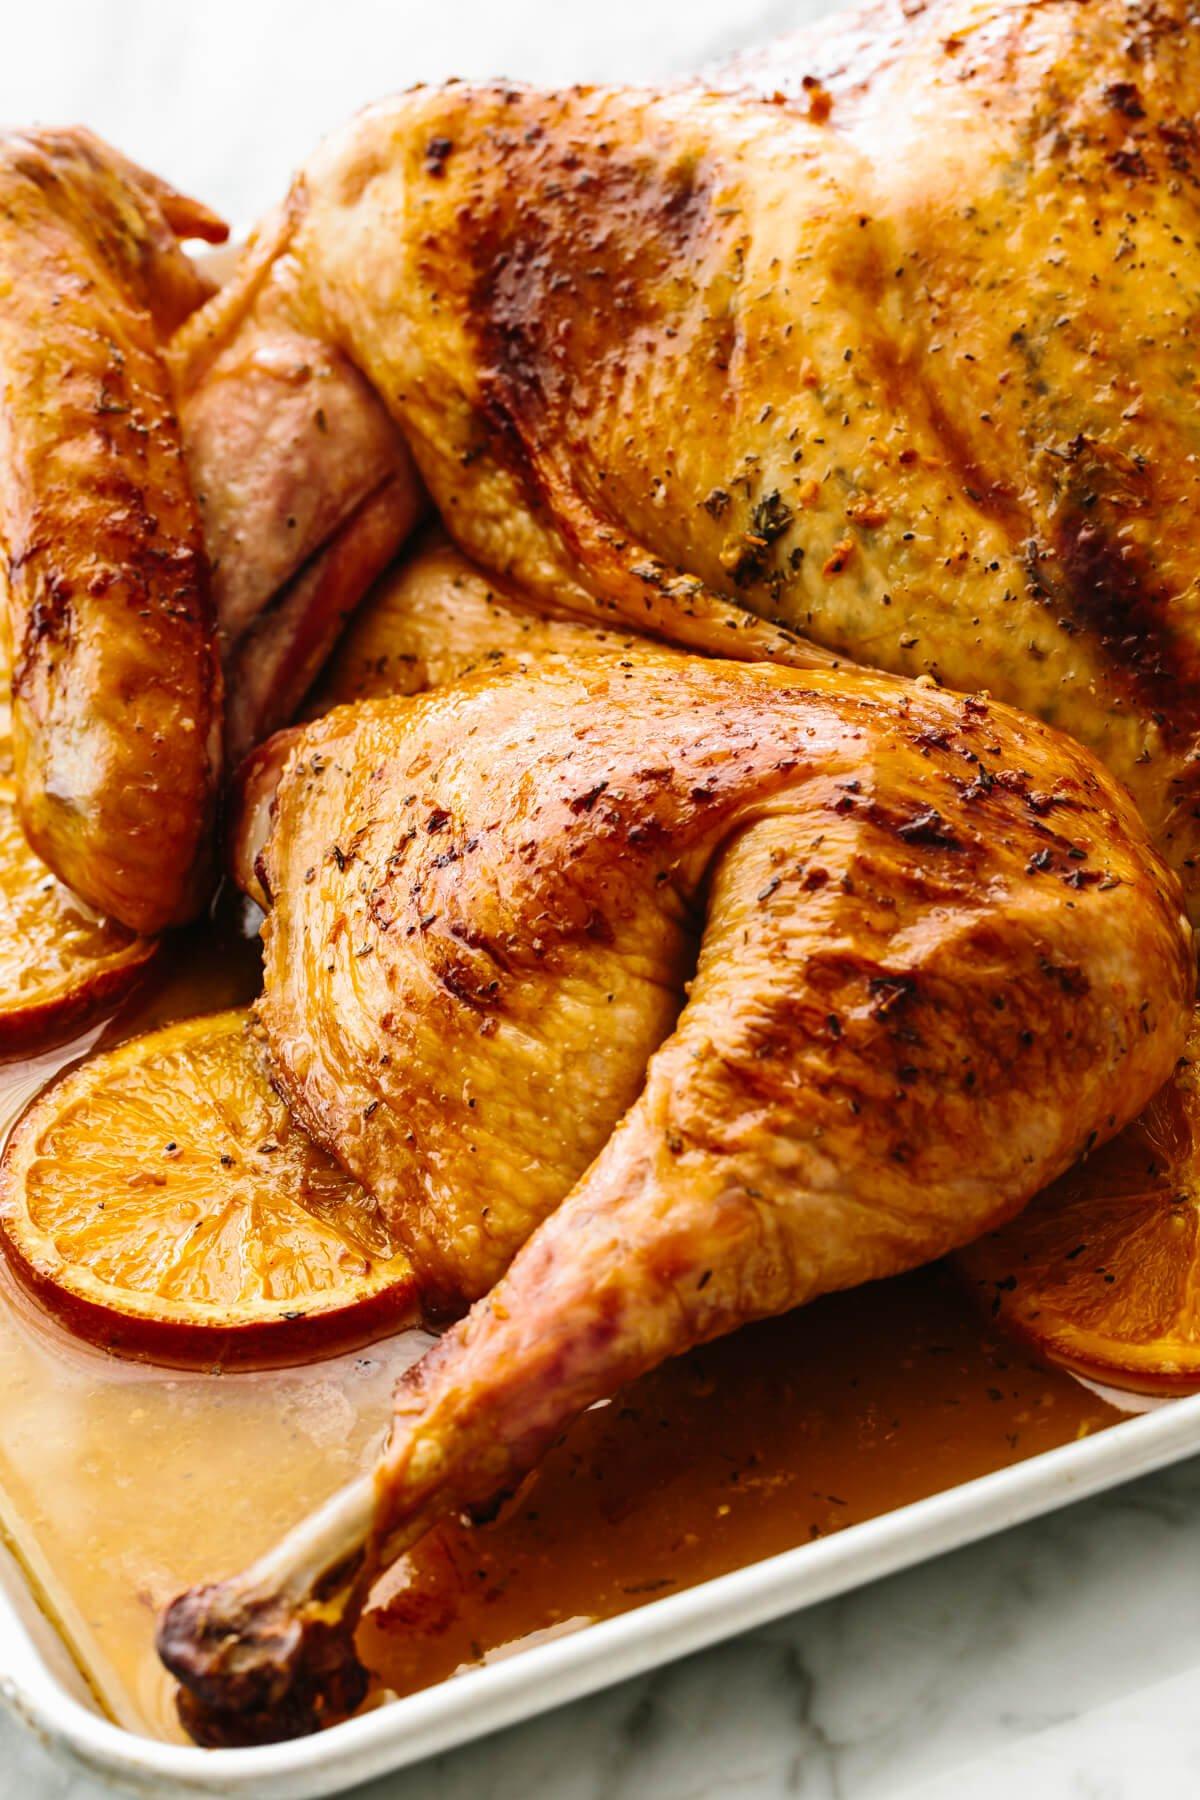 Maple orange glazed spatchcock turkey on a sheet pan.